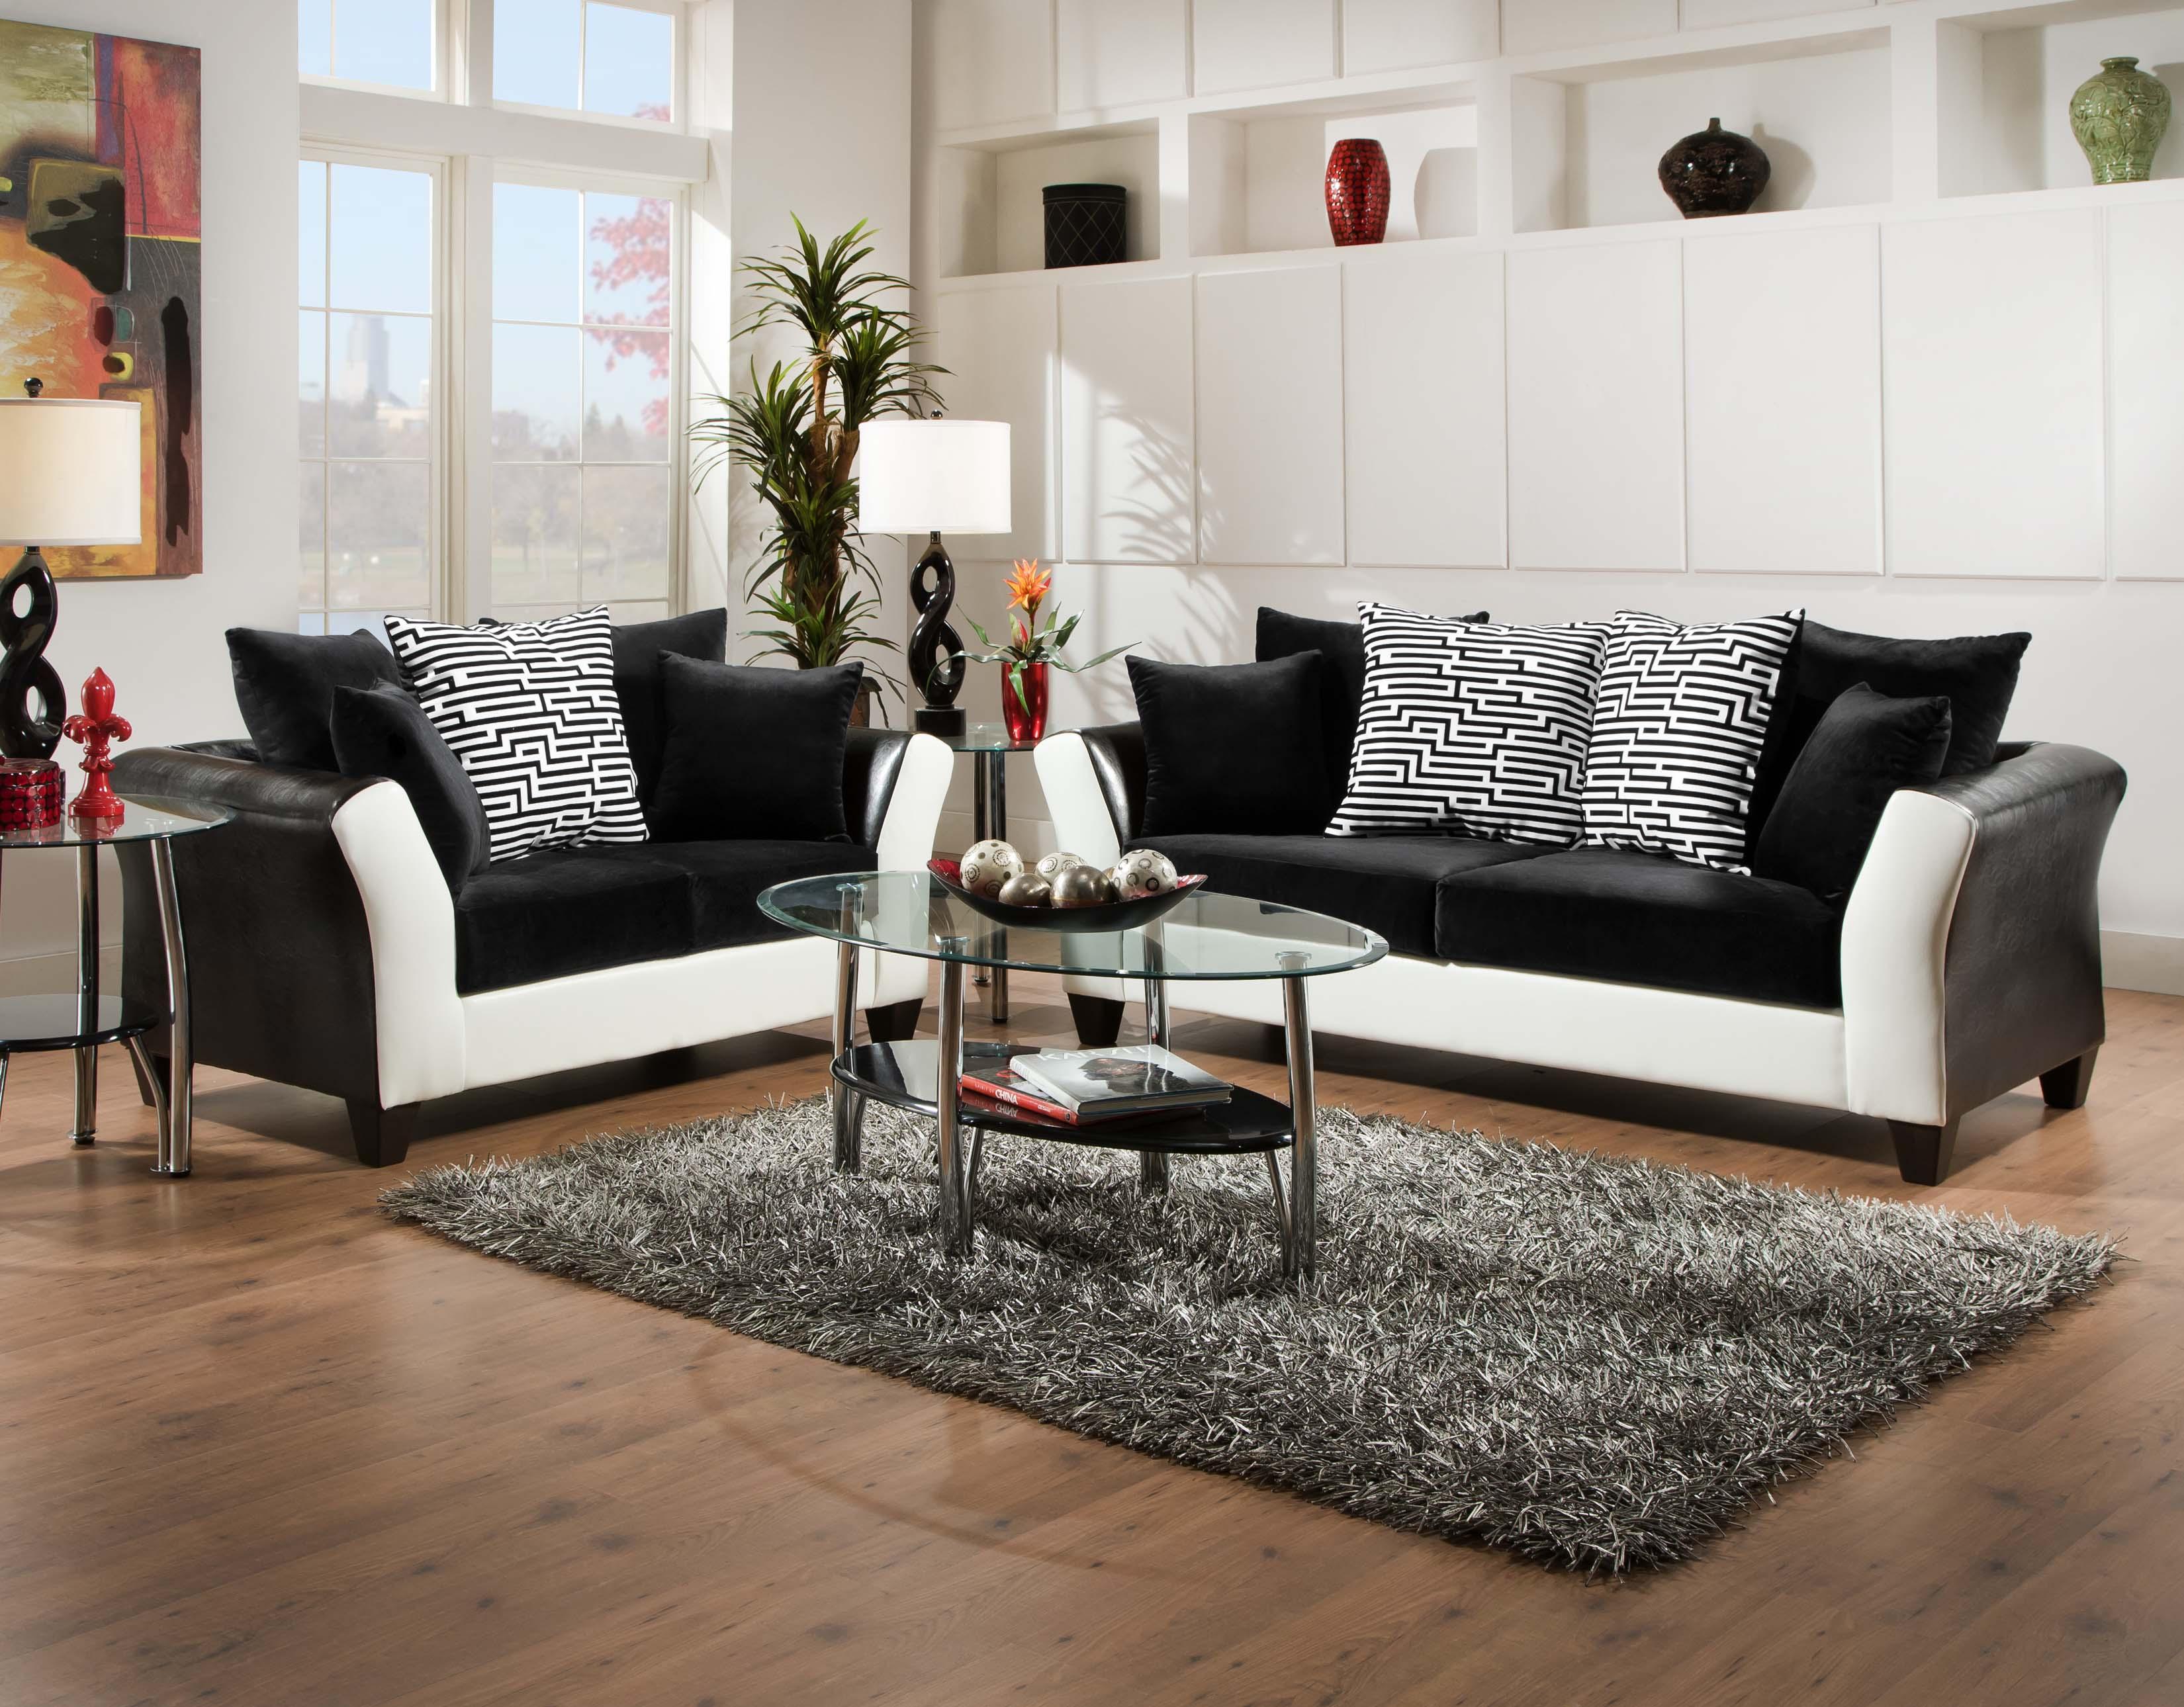 Diy Patio Furniture Loveseat